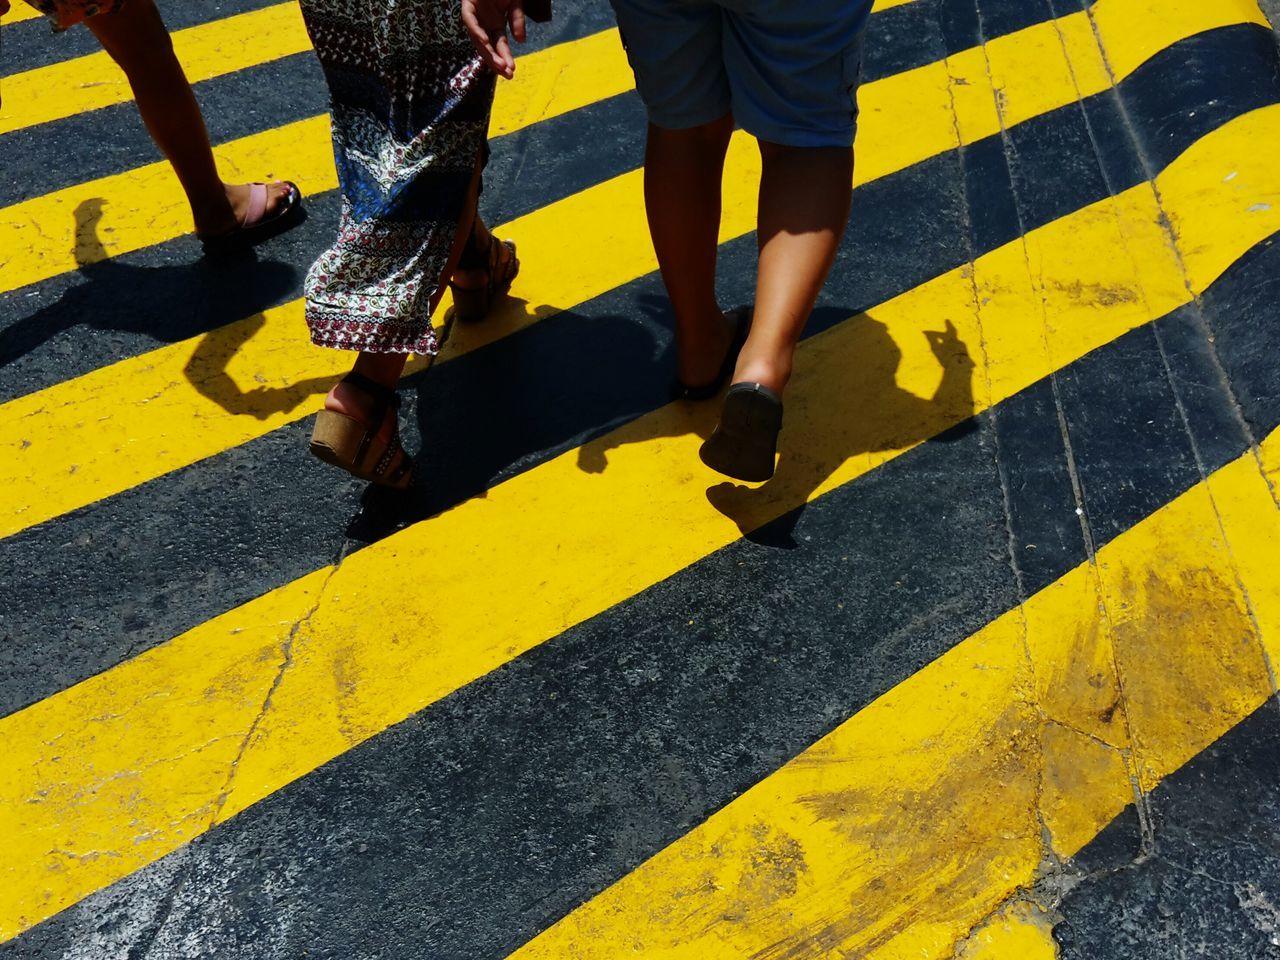 Carpe diem. My Commute Streetphotography Lima Perú EyeEm Lines EyeEm X Mashable - My Commute